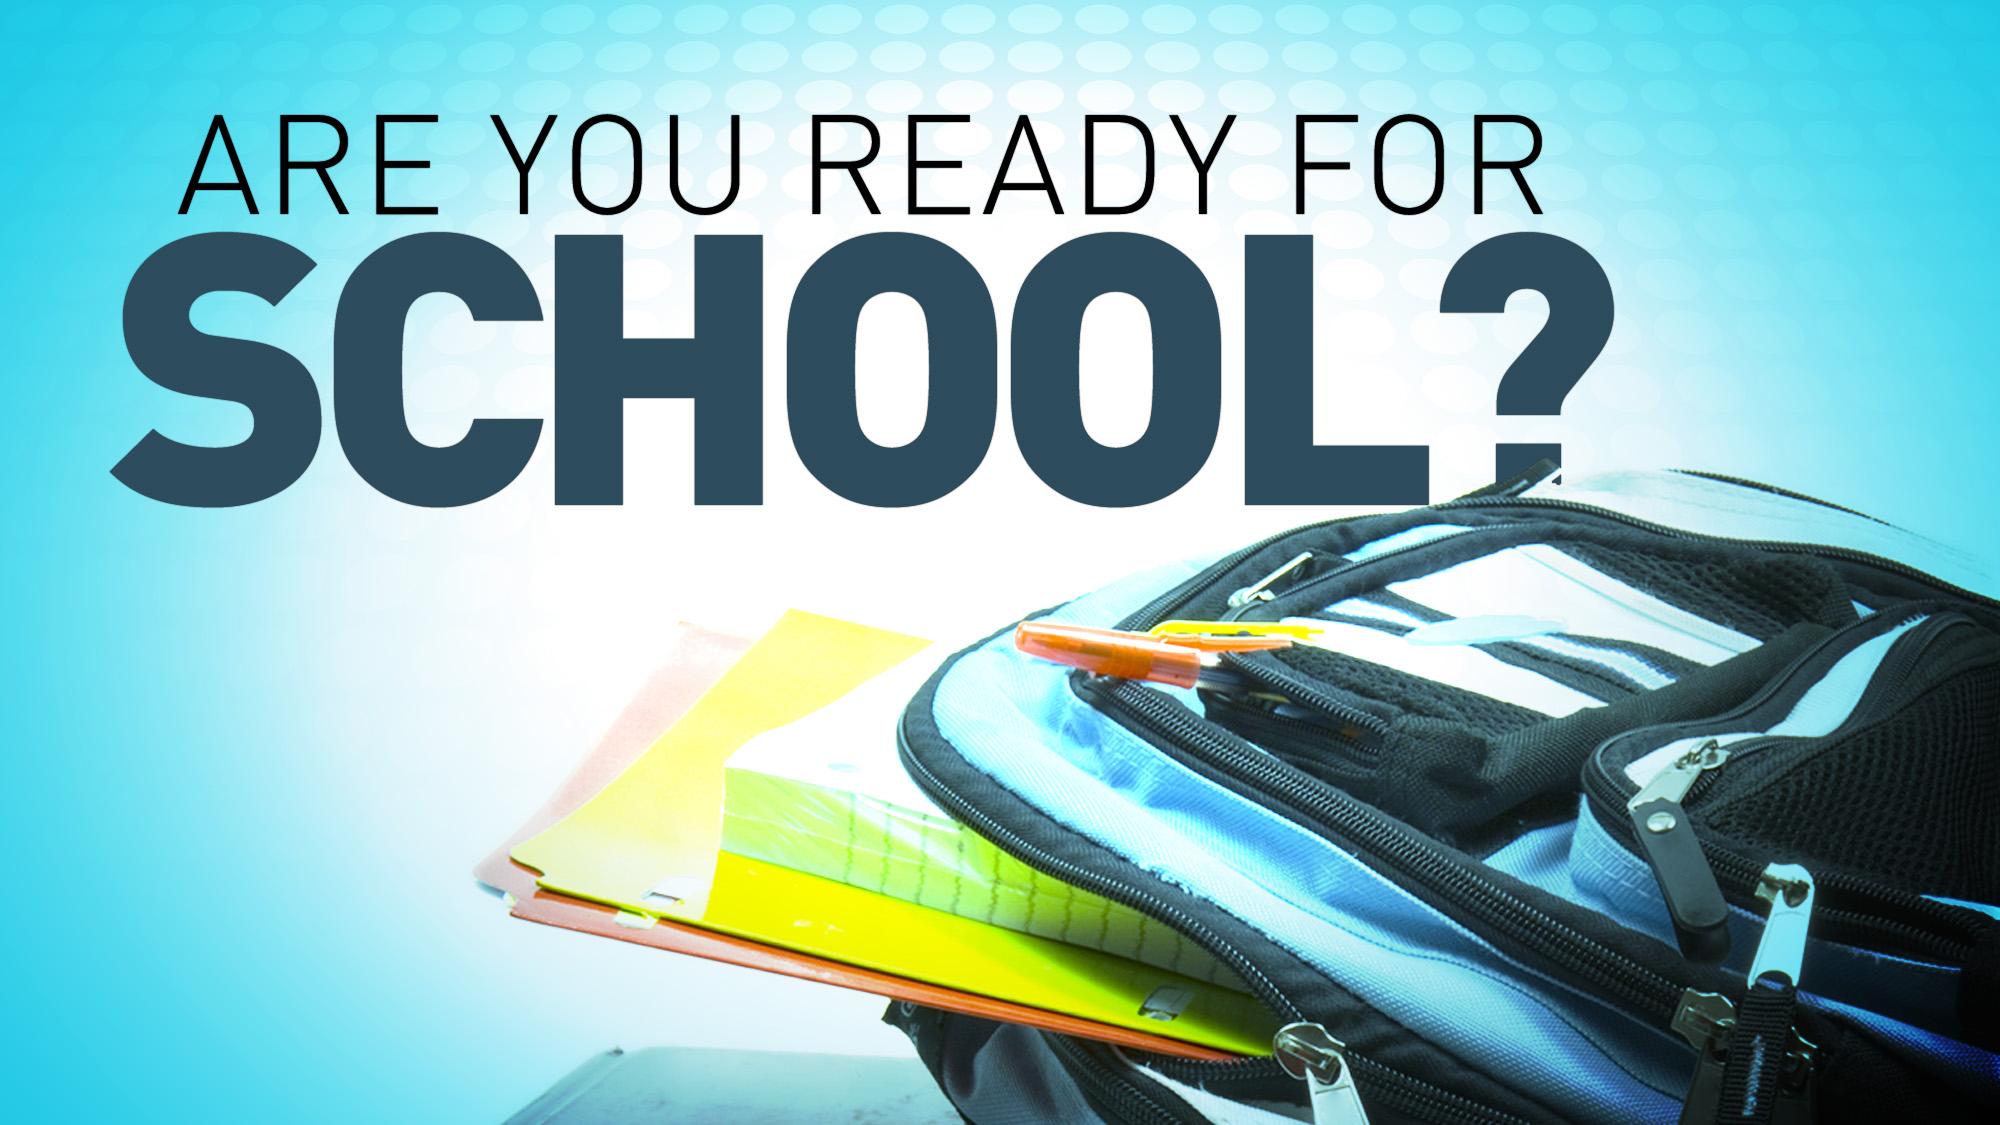 Are you ready for school? – Vision Baptist Church in Alpharetta, GA